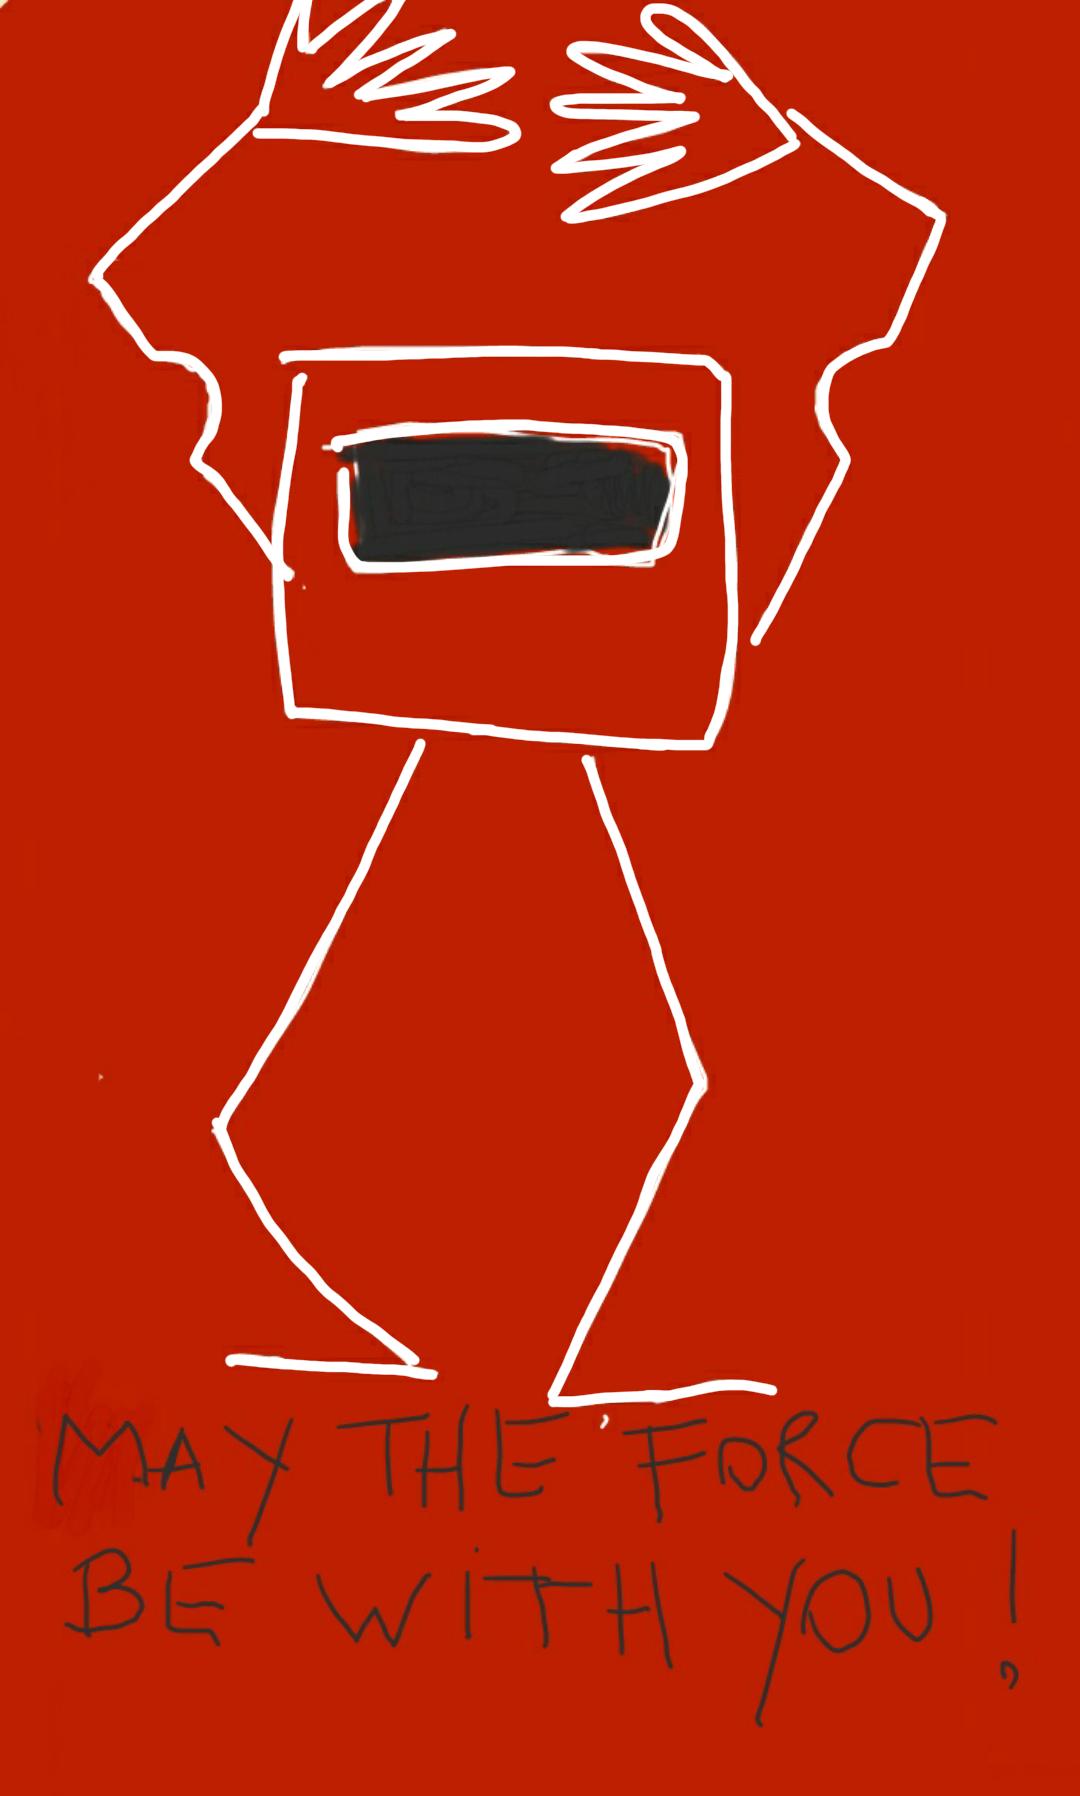 sketch-1489199313456.png